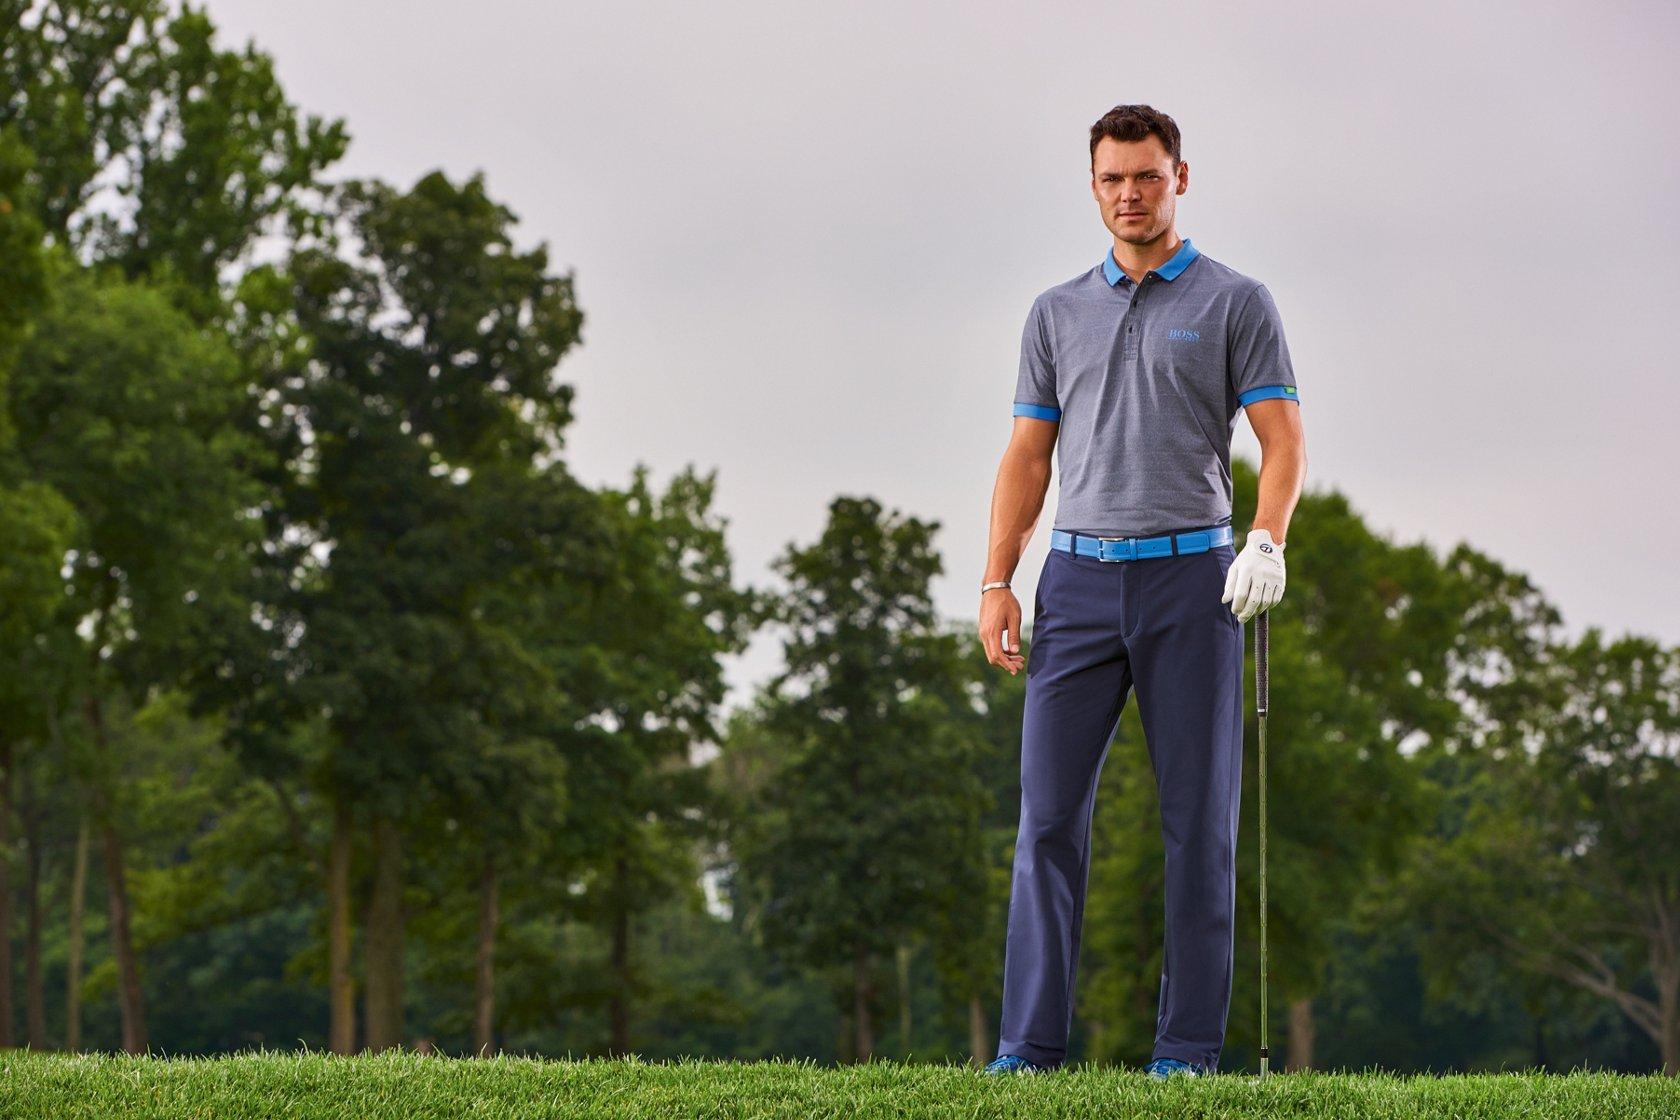 besserer Preis für beste Wahl besser Meet the Golf Pros - BOSS Green